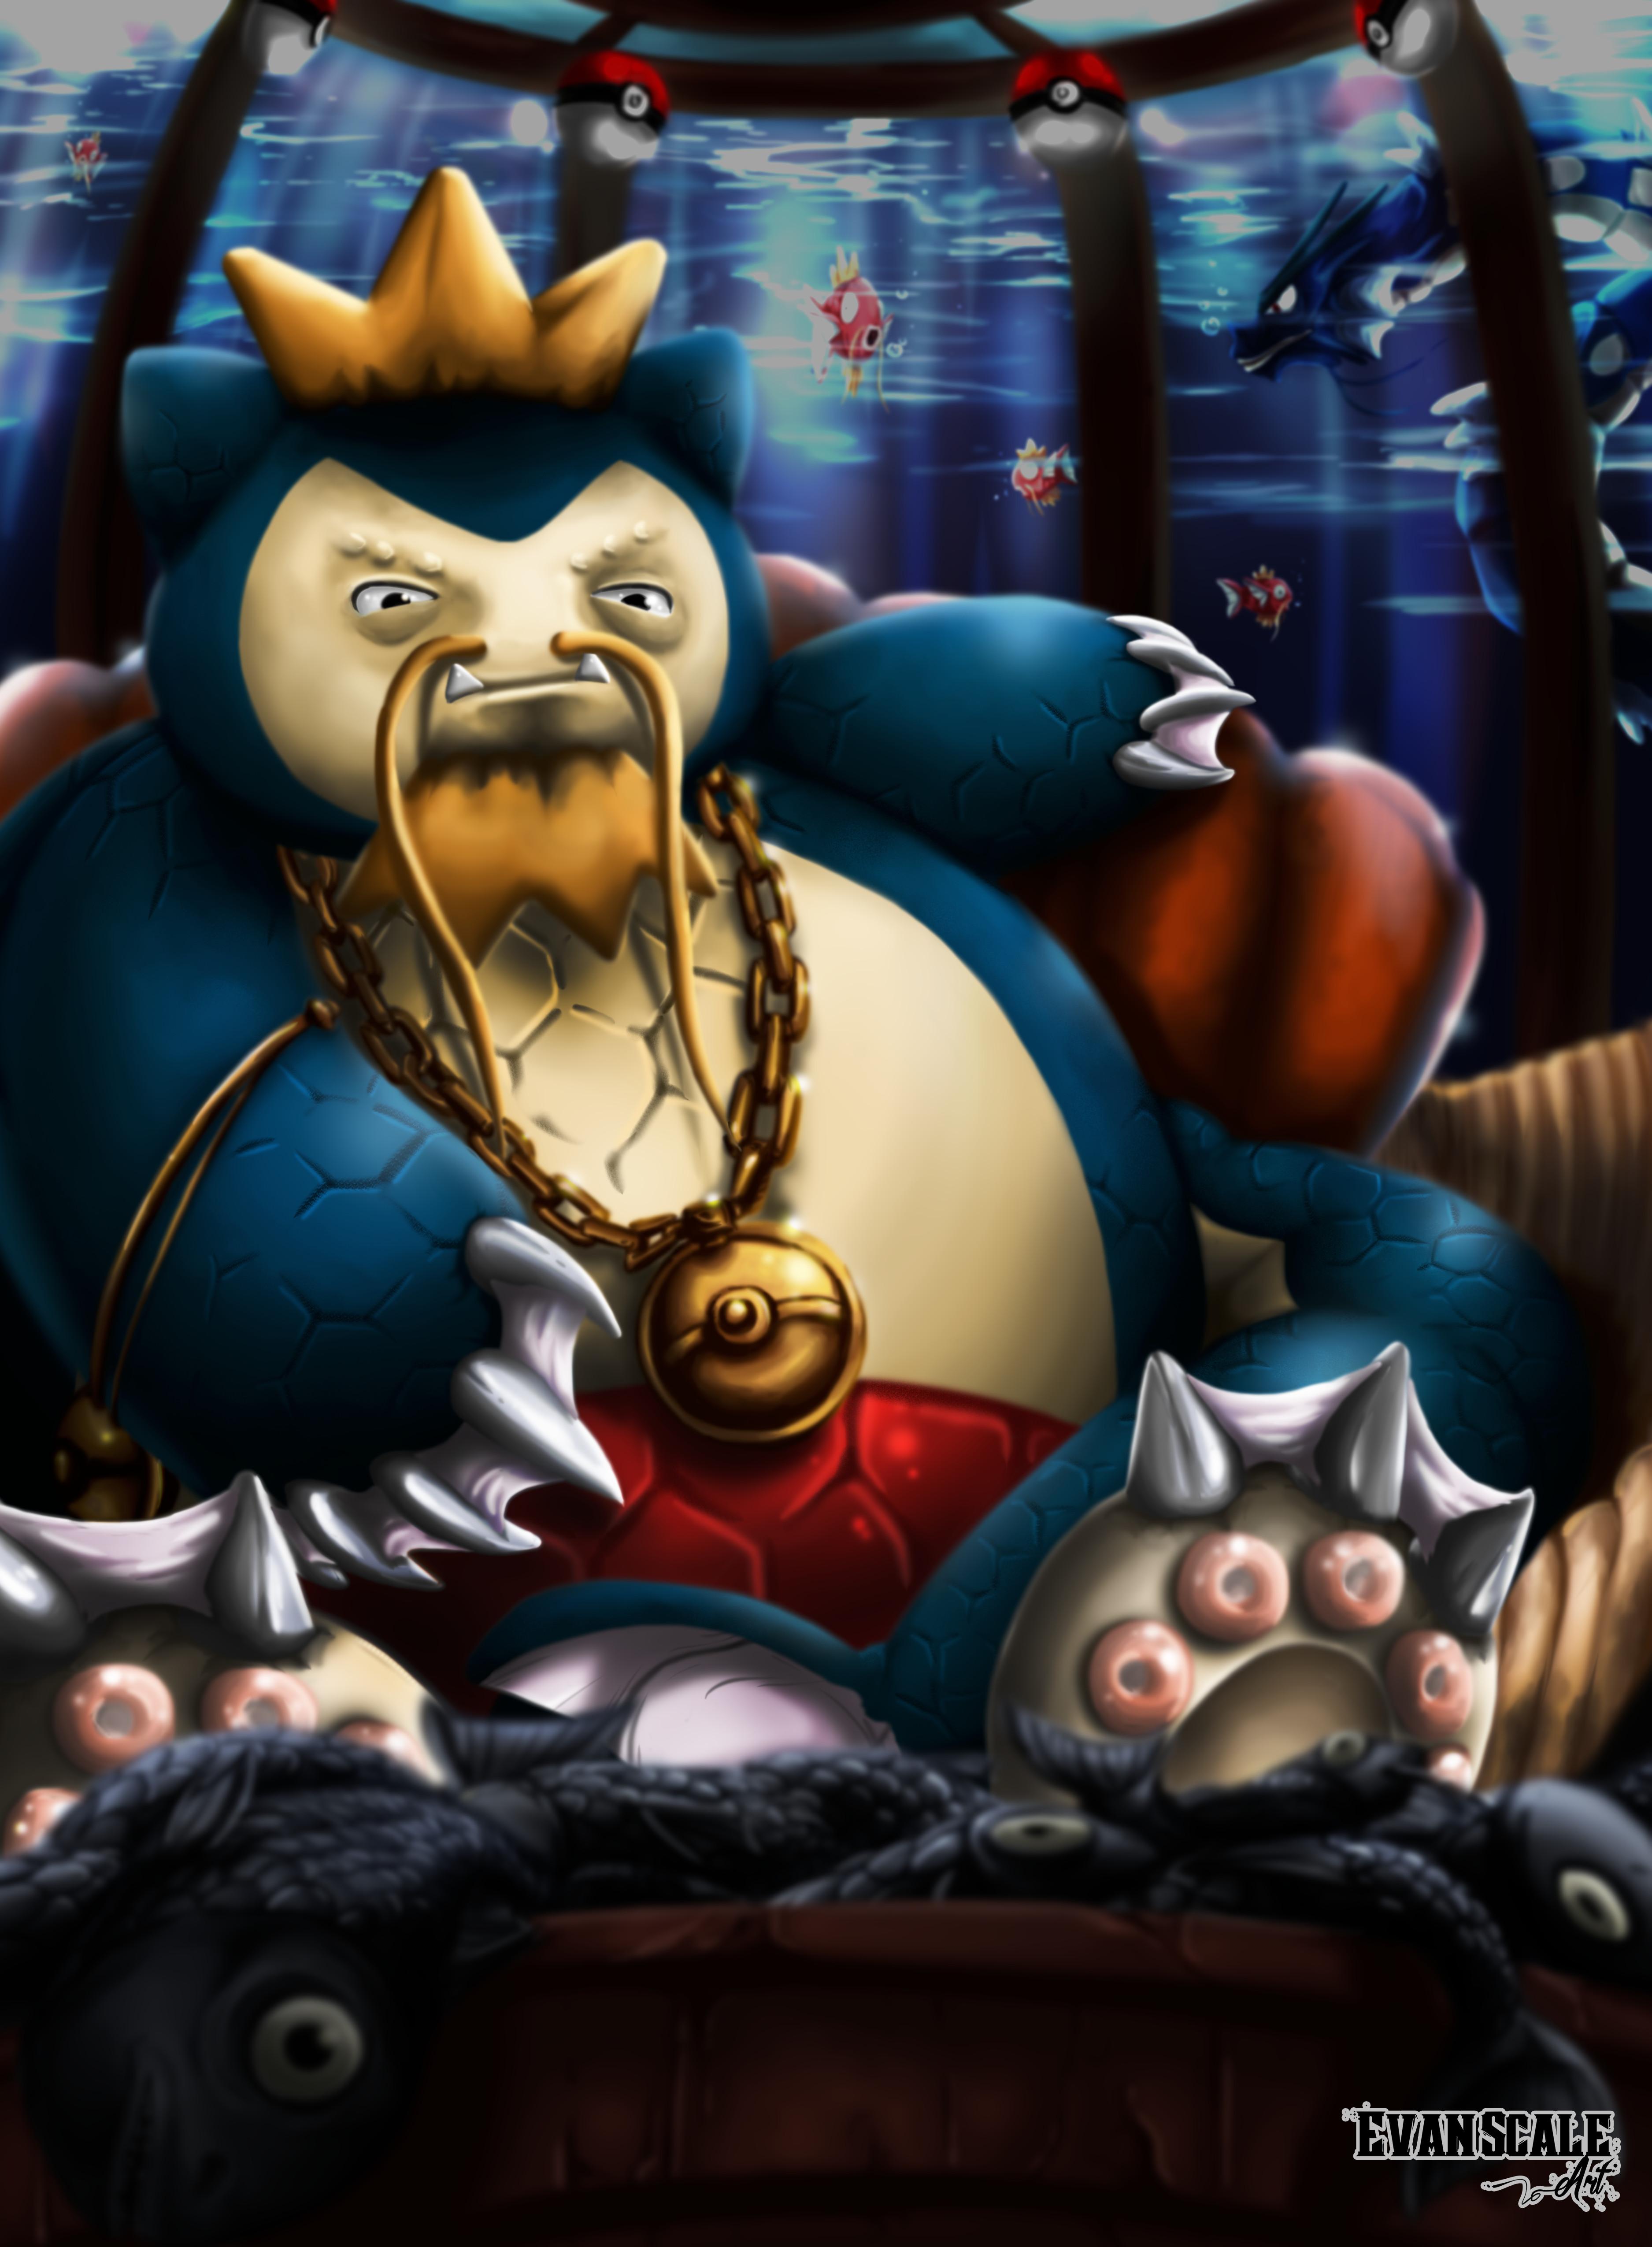 King Magirlax of the Deep (Magikarp+Snorlax)